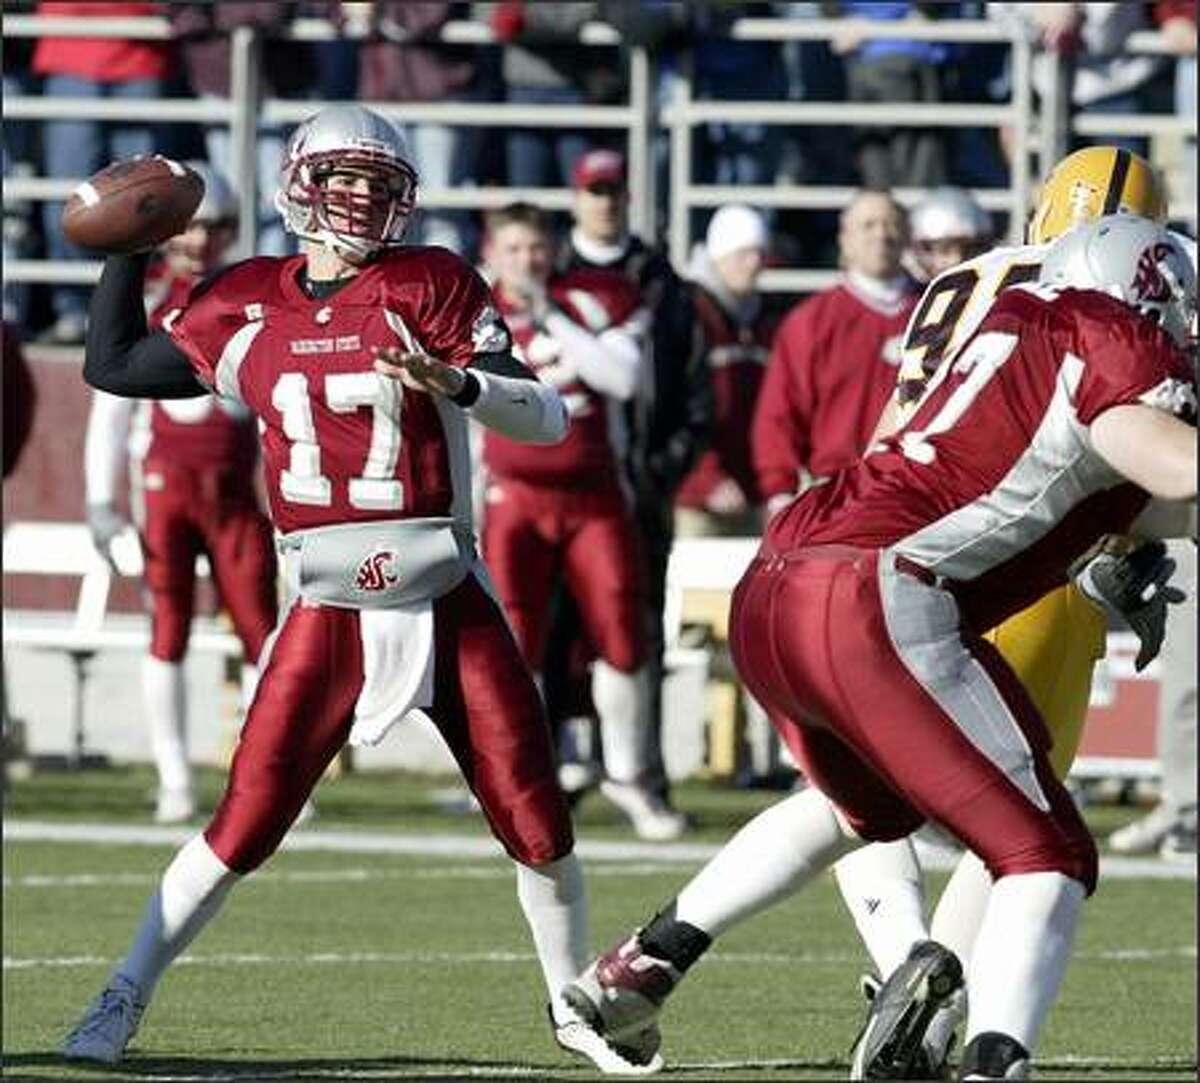 Washington State quarterback Jason Gesser (17) sets up to throw a touchdown pass against Arizona State during the first quarter Saturday, Nov. 2, 2002 at Martin Stadium in Pullman, Wash. (AP Photo/Jeff T. Green)